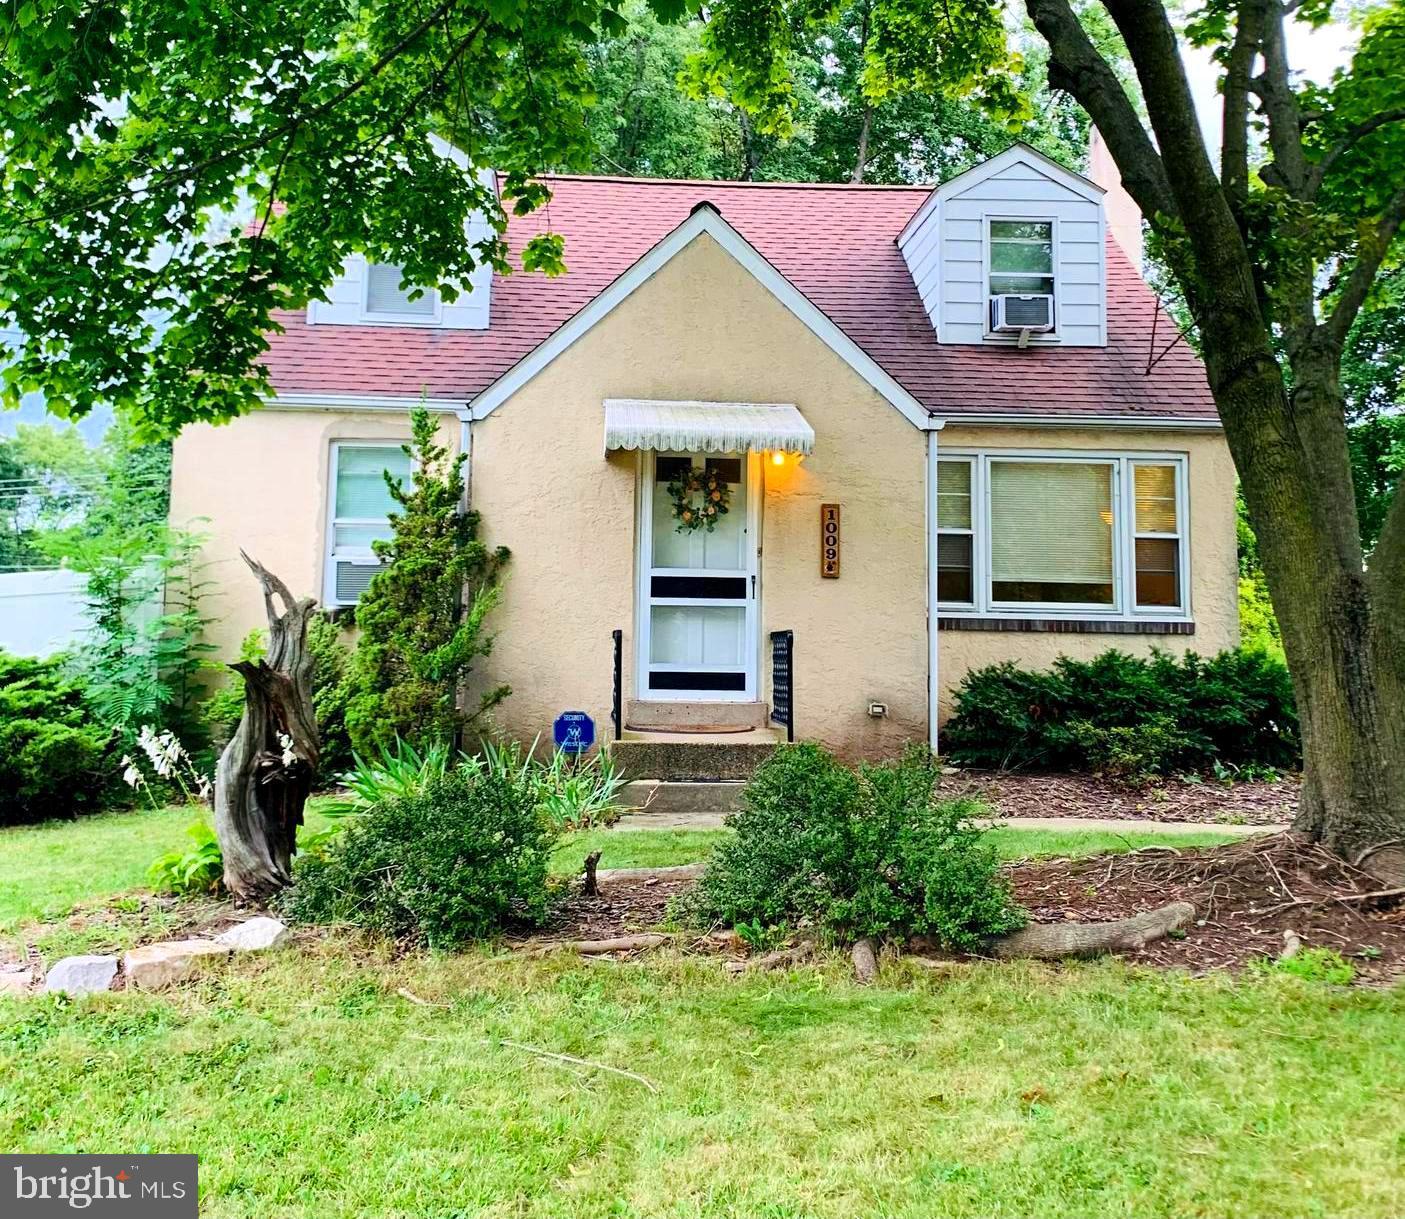 1009 E MAIN STREET, LANSDALE, Pennsylvania 19446, 4 Bedrooms Bedrooms, ,2 BathroomsBathrooms,Single Family,For Sale,1009 E MAIN STREET,PAMC668790